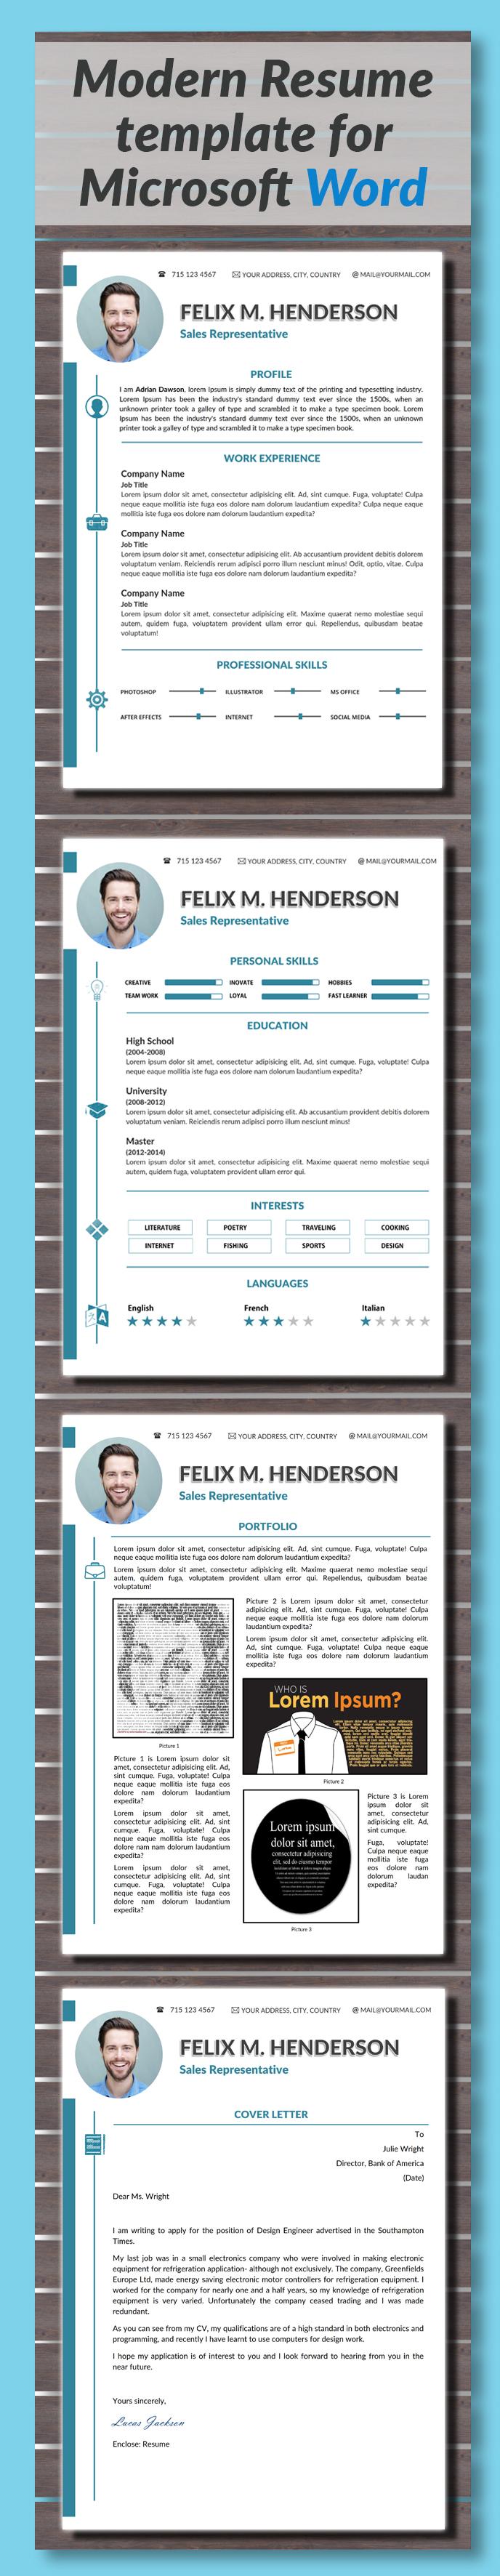 modern resume template cover letter portfolio business